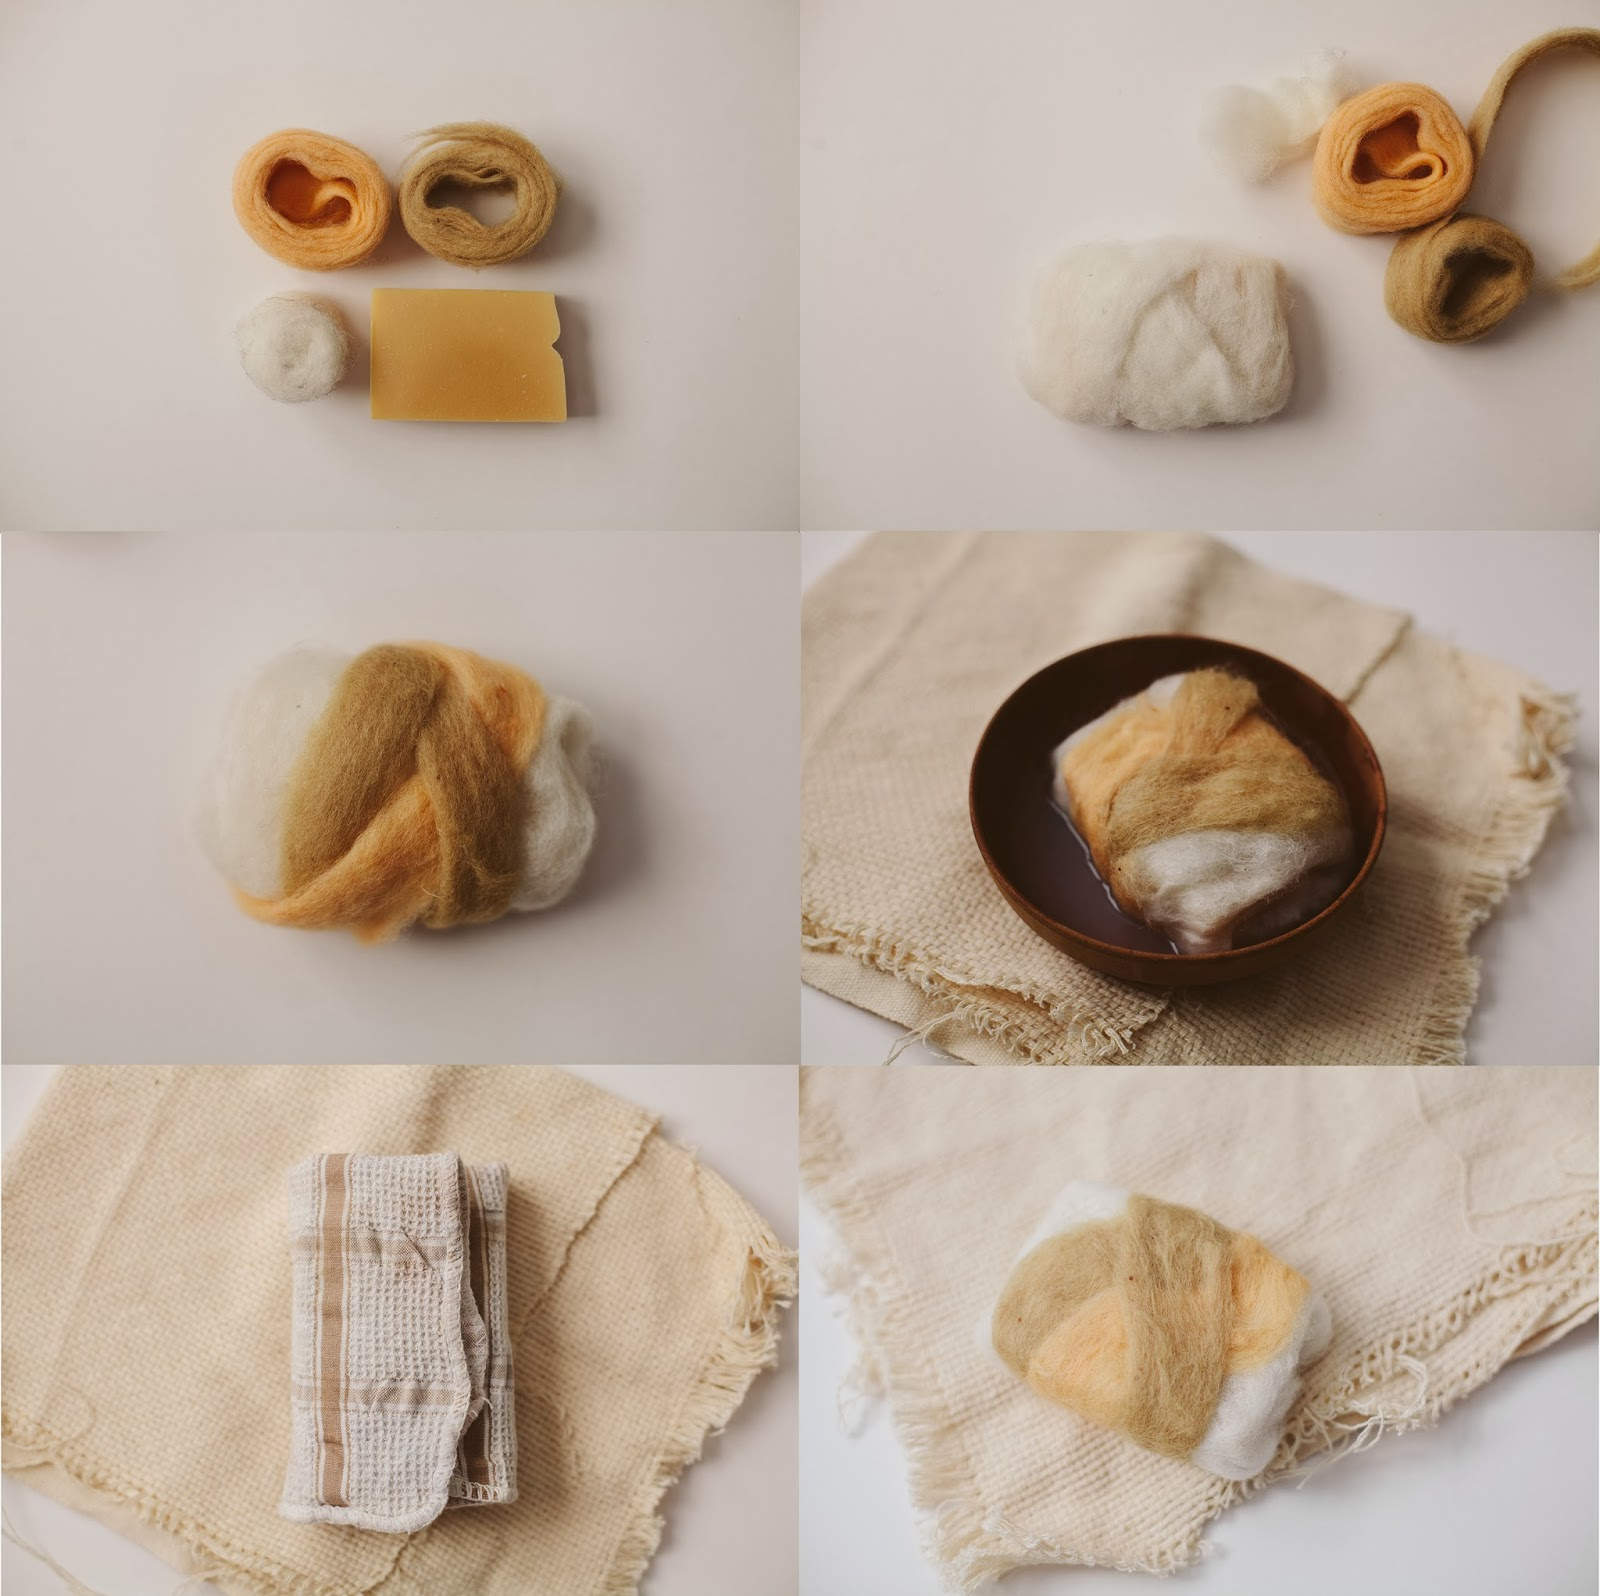 Wooled Soap Bar Tutorial | Clean Living